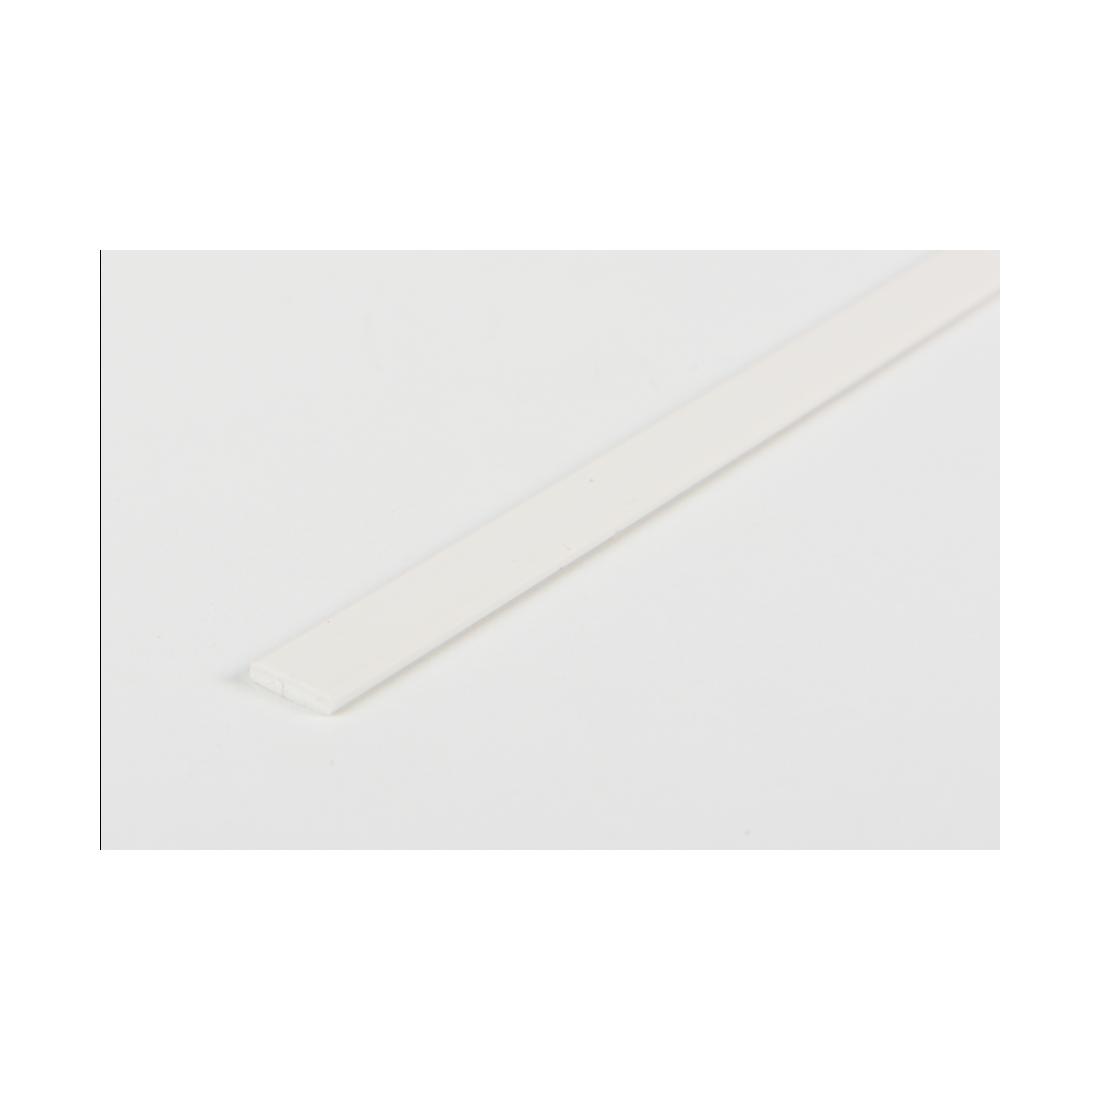 Profile ASA rectangulaire mm.1,5x8x1000